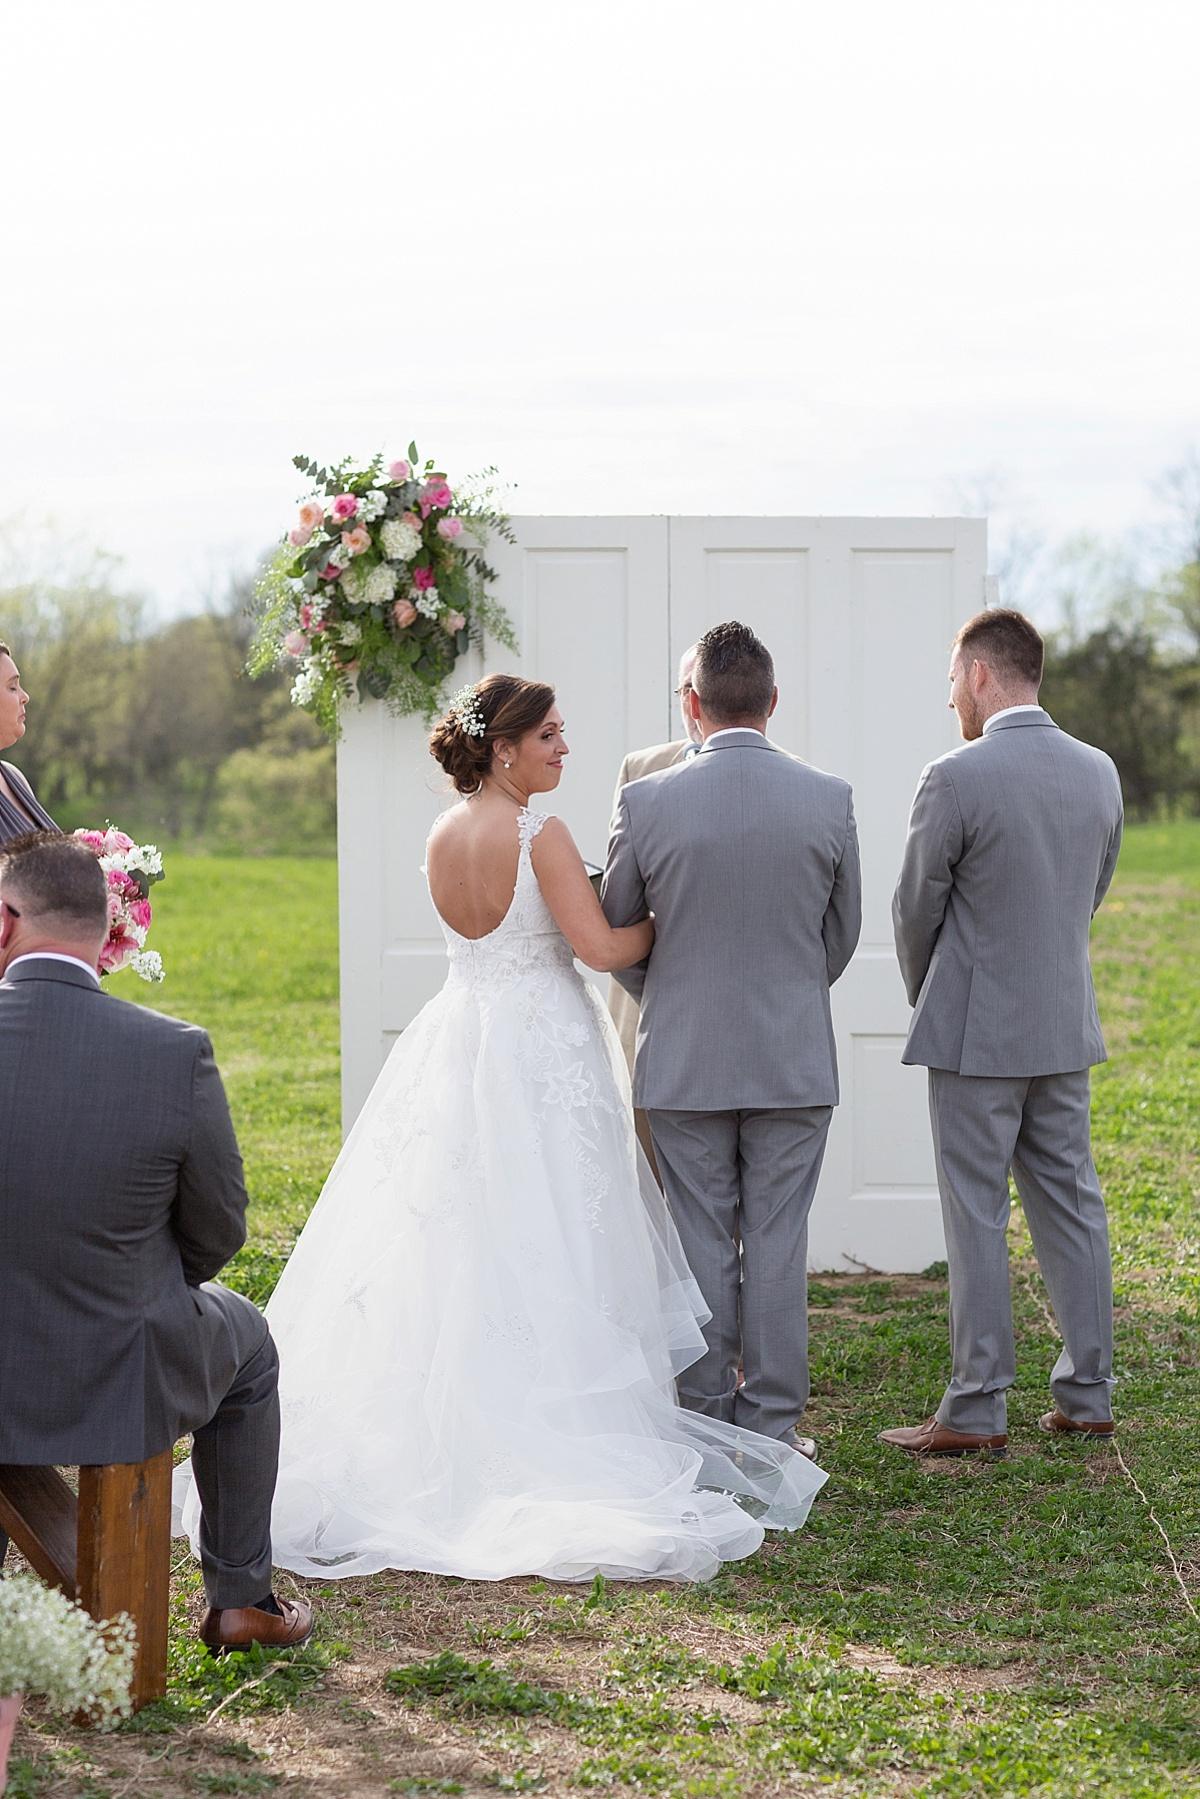 henry-county-wedding-kentucky-farm-spring-wedding-31.JPG